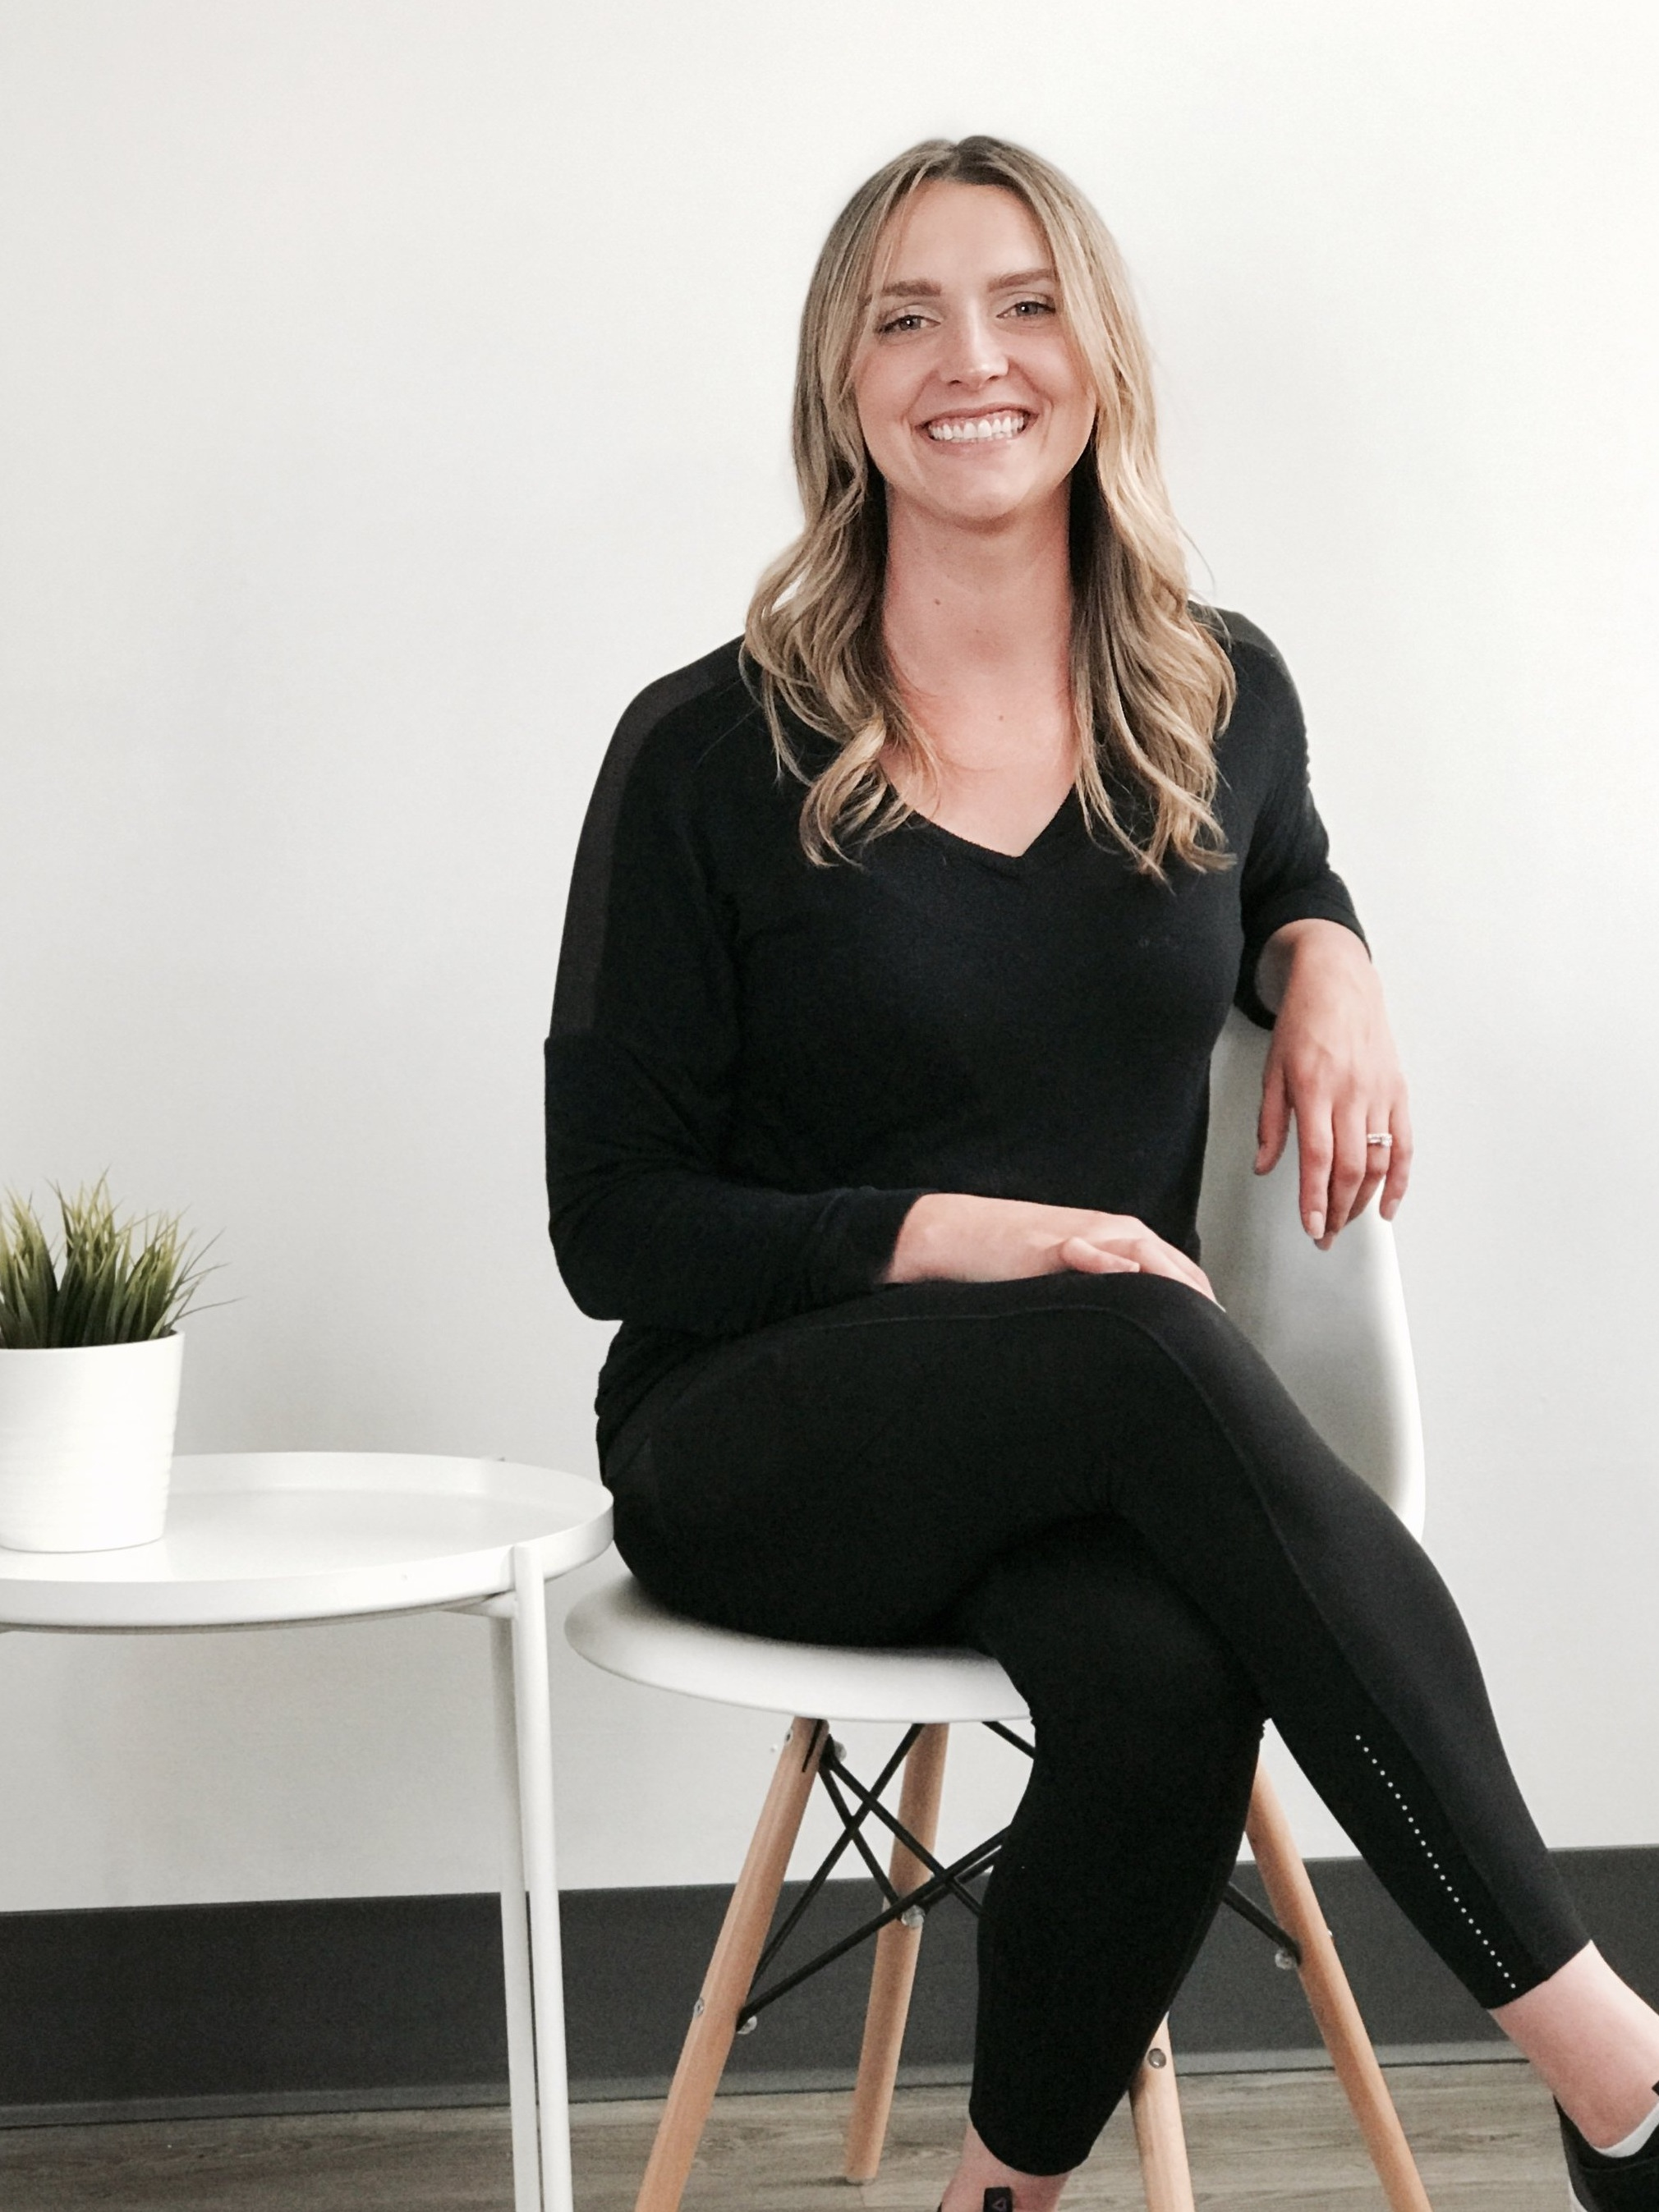 Carolyn Chylia, R. Kin., FST Registered Kinesiologist and Fascial Stretch Therapist